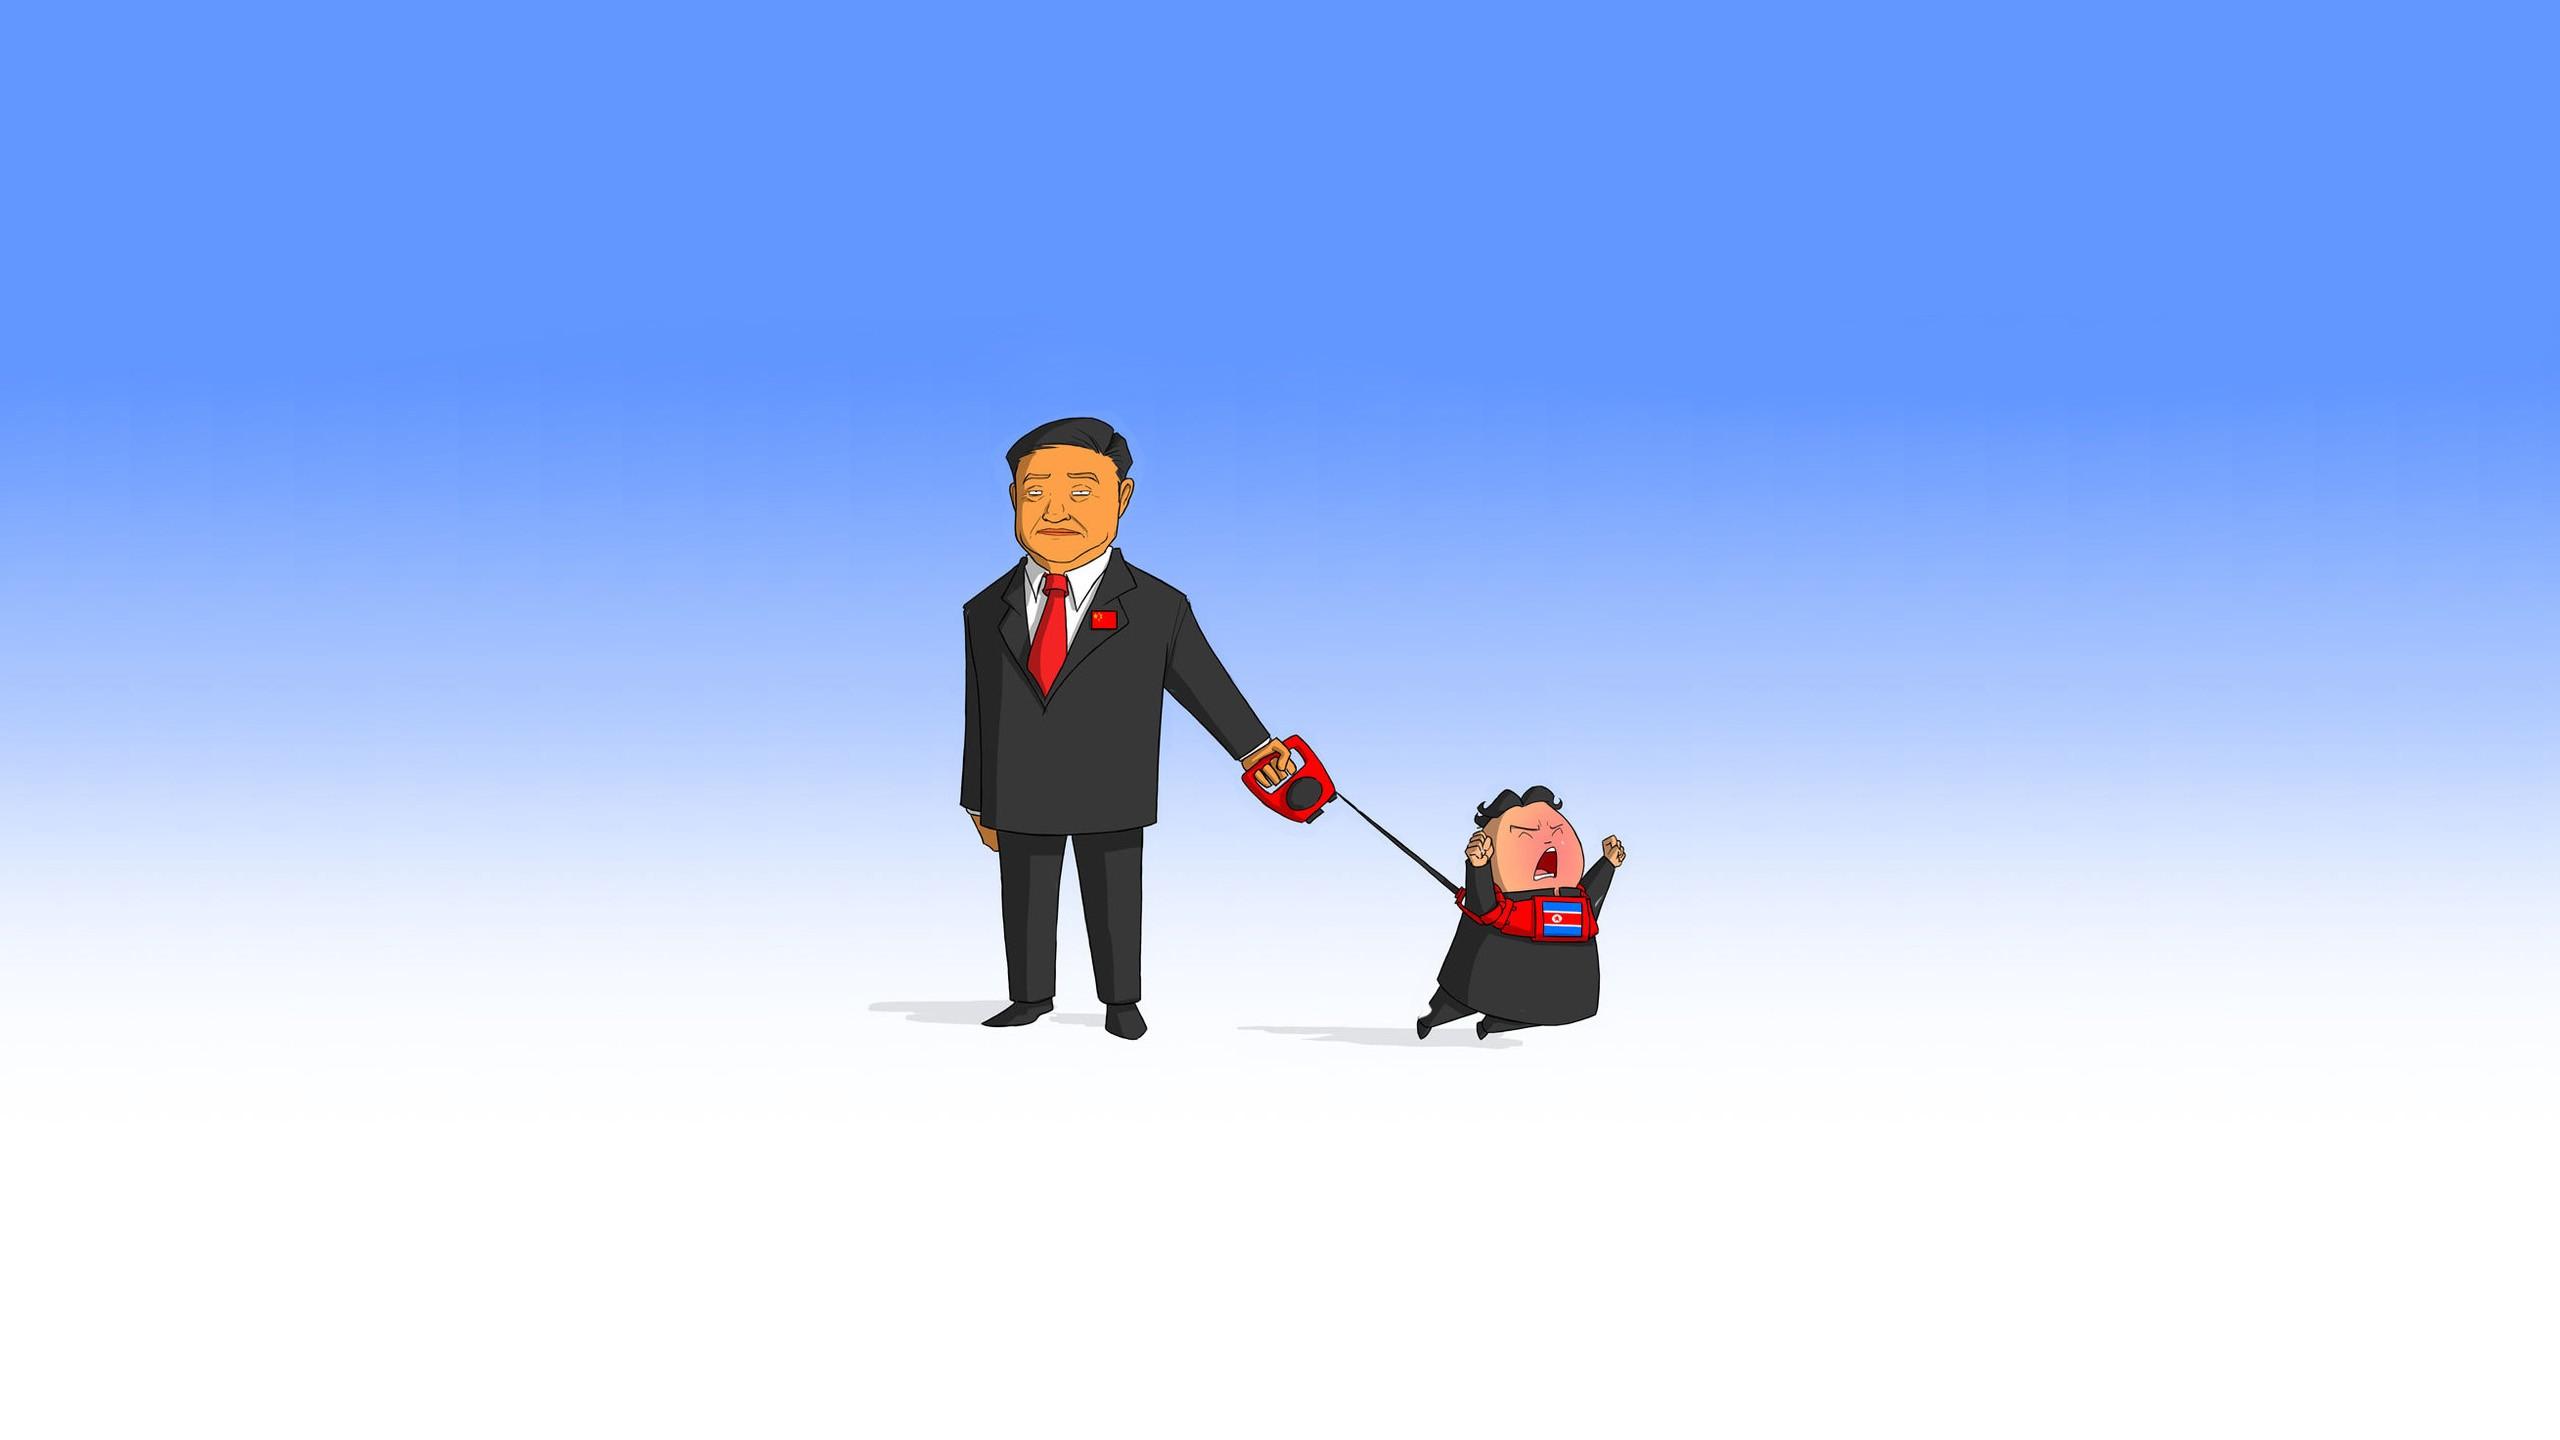 Wallpaper Simple Background China Cartoon Brand Walking Play North Korea Leash 2560x1440 Px 2560x1440 525938 Hd Wallpapers Wallhere